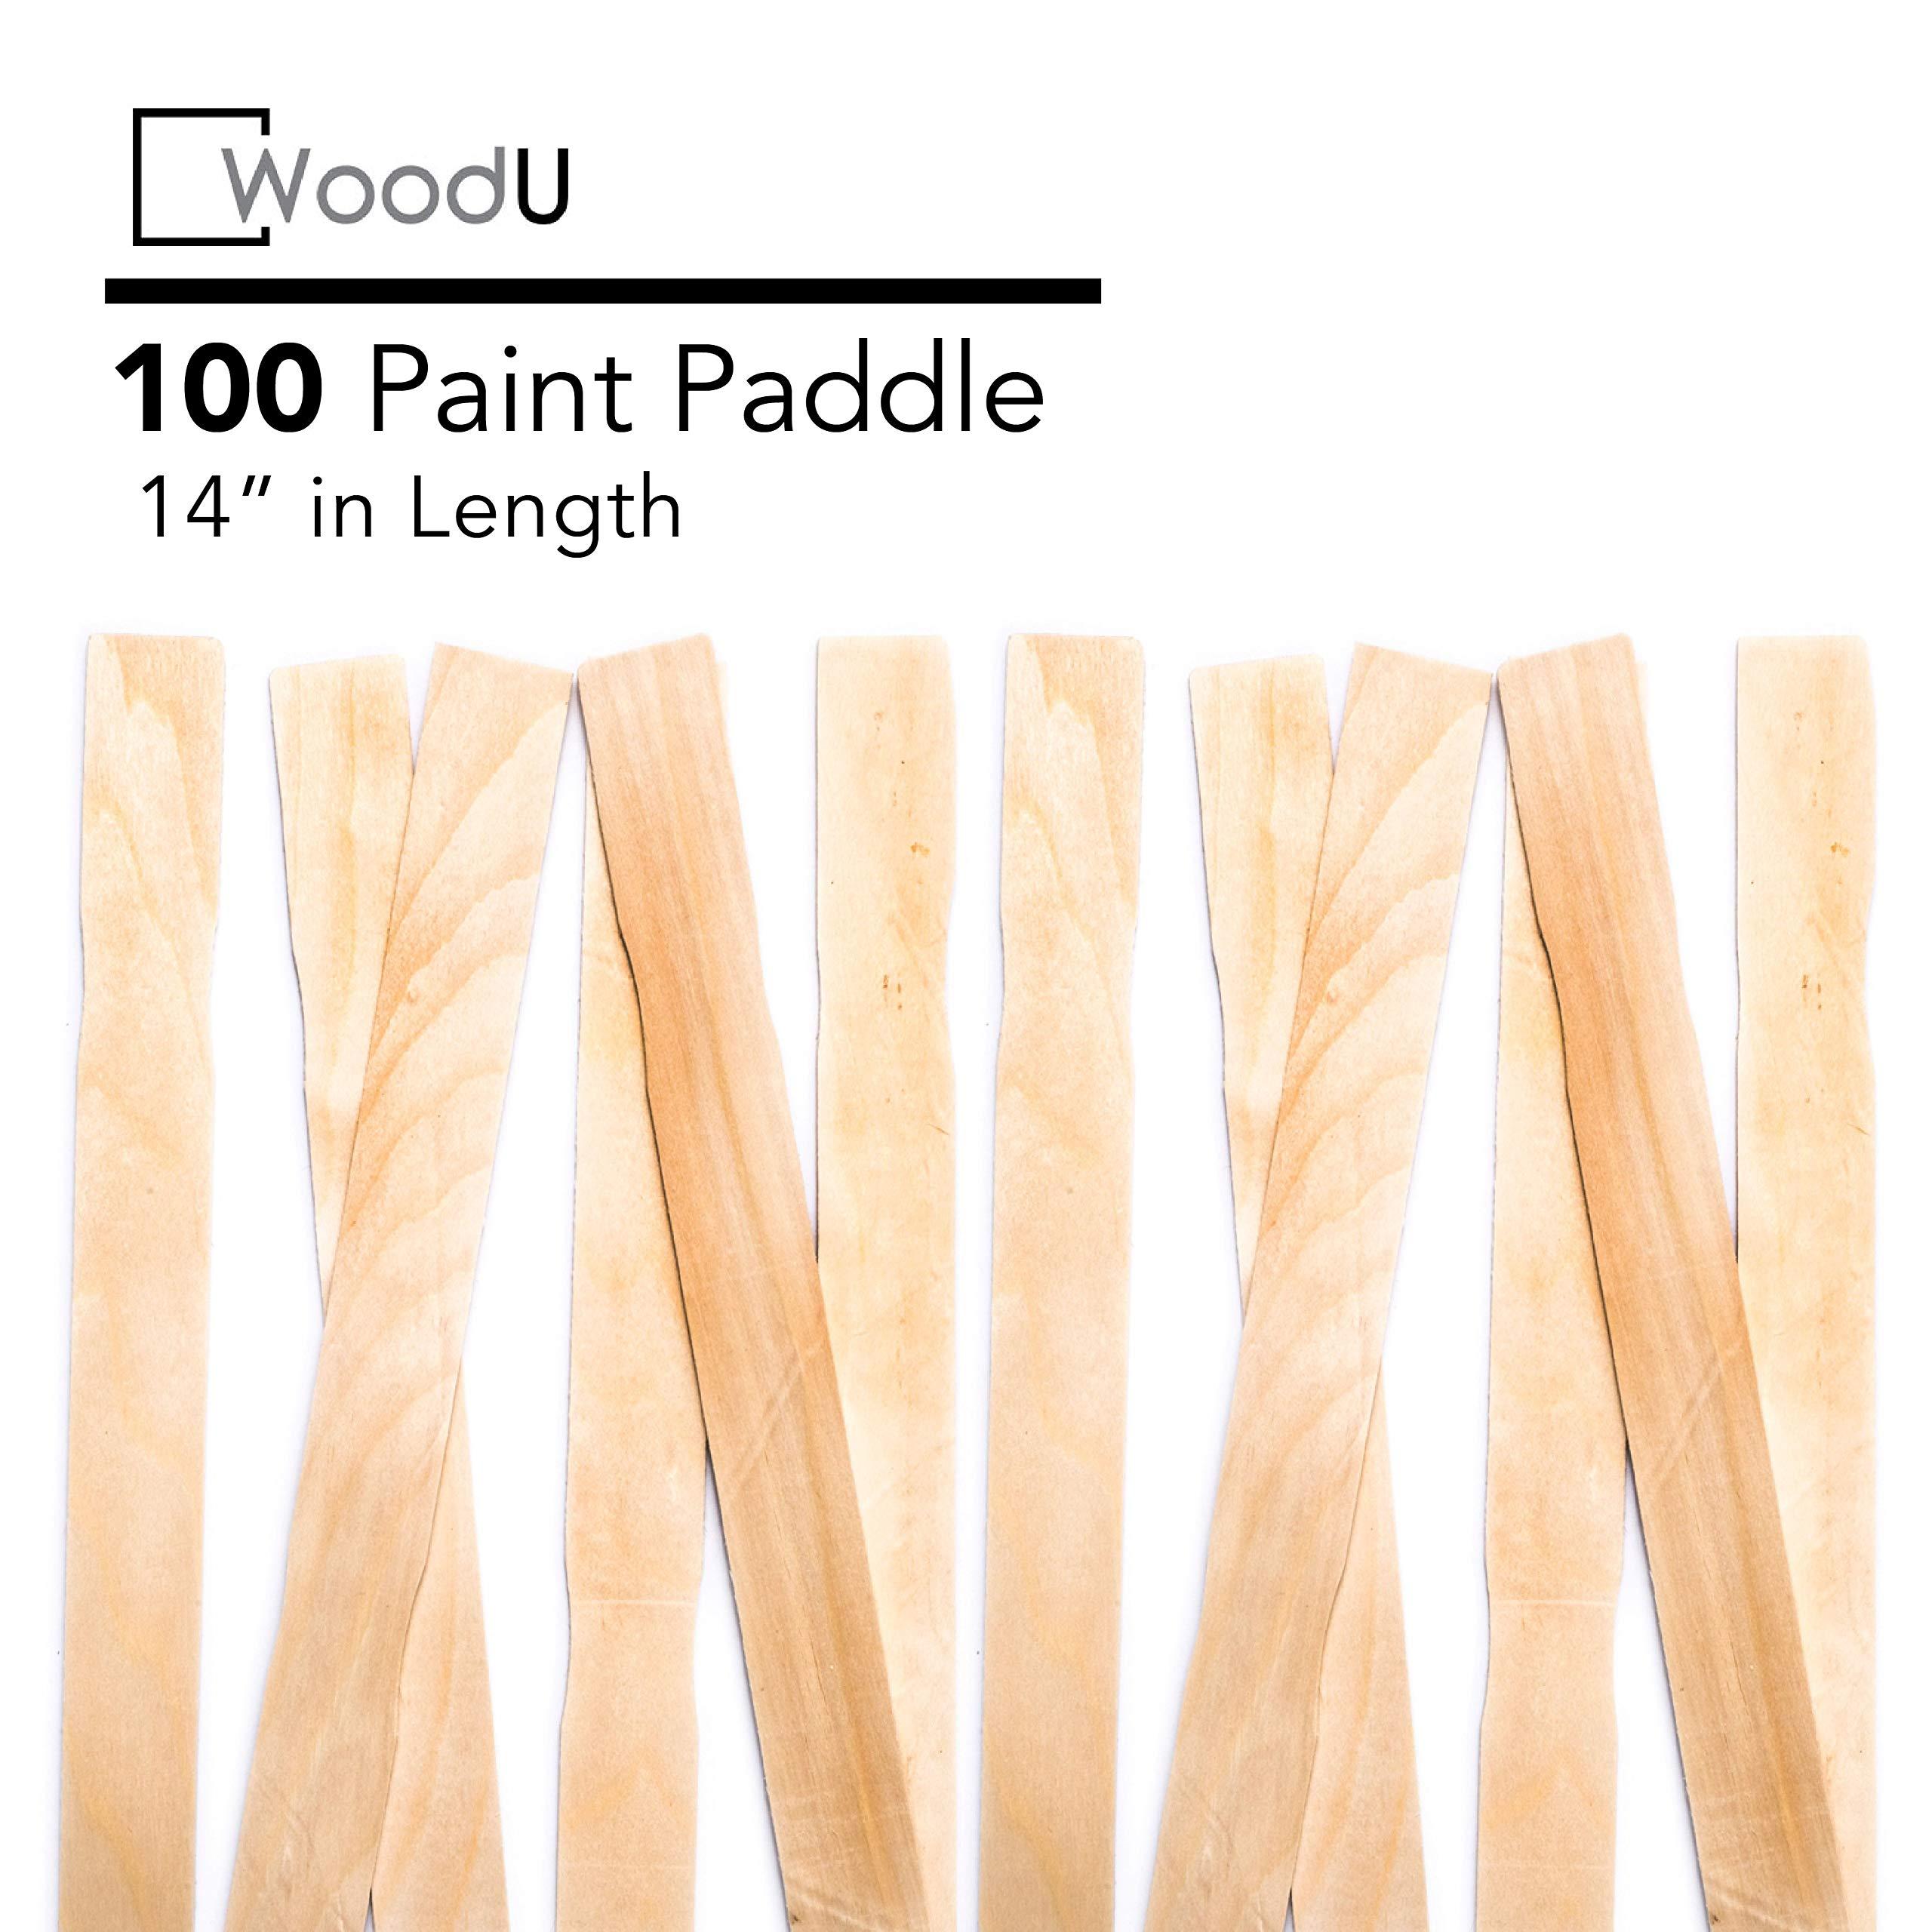 "Wooden Paint Stir Sticks 14"" Bulk Pack 100pc, DIY Paint Paddles for Mixing Paint and Other Liquids"